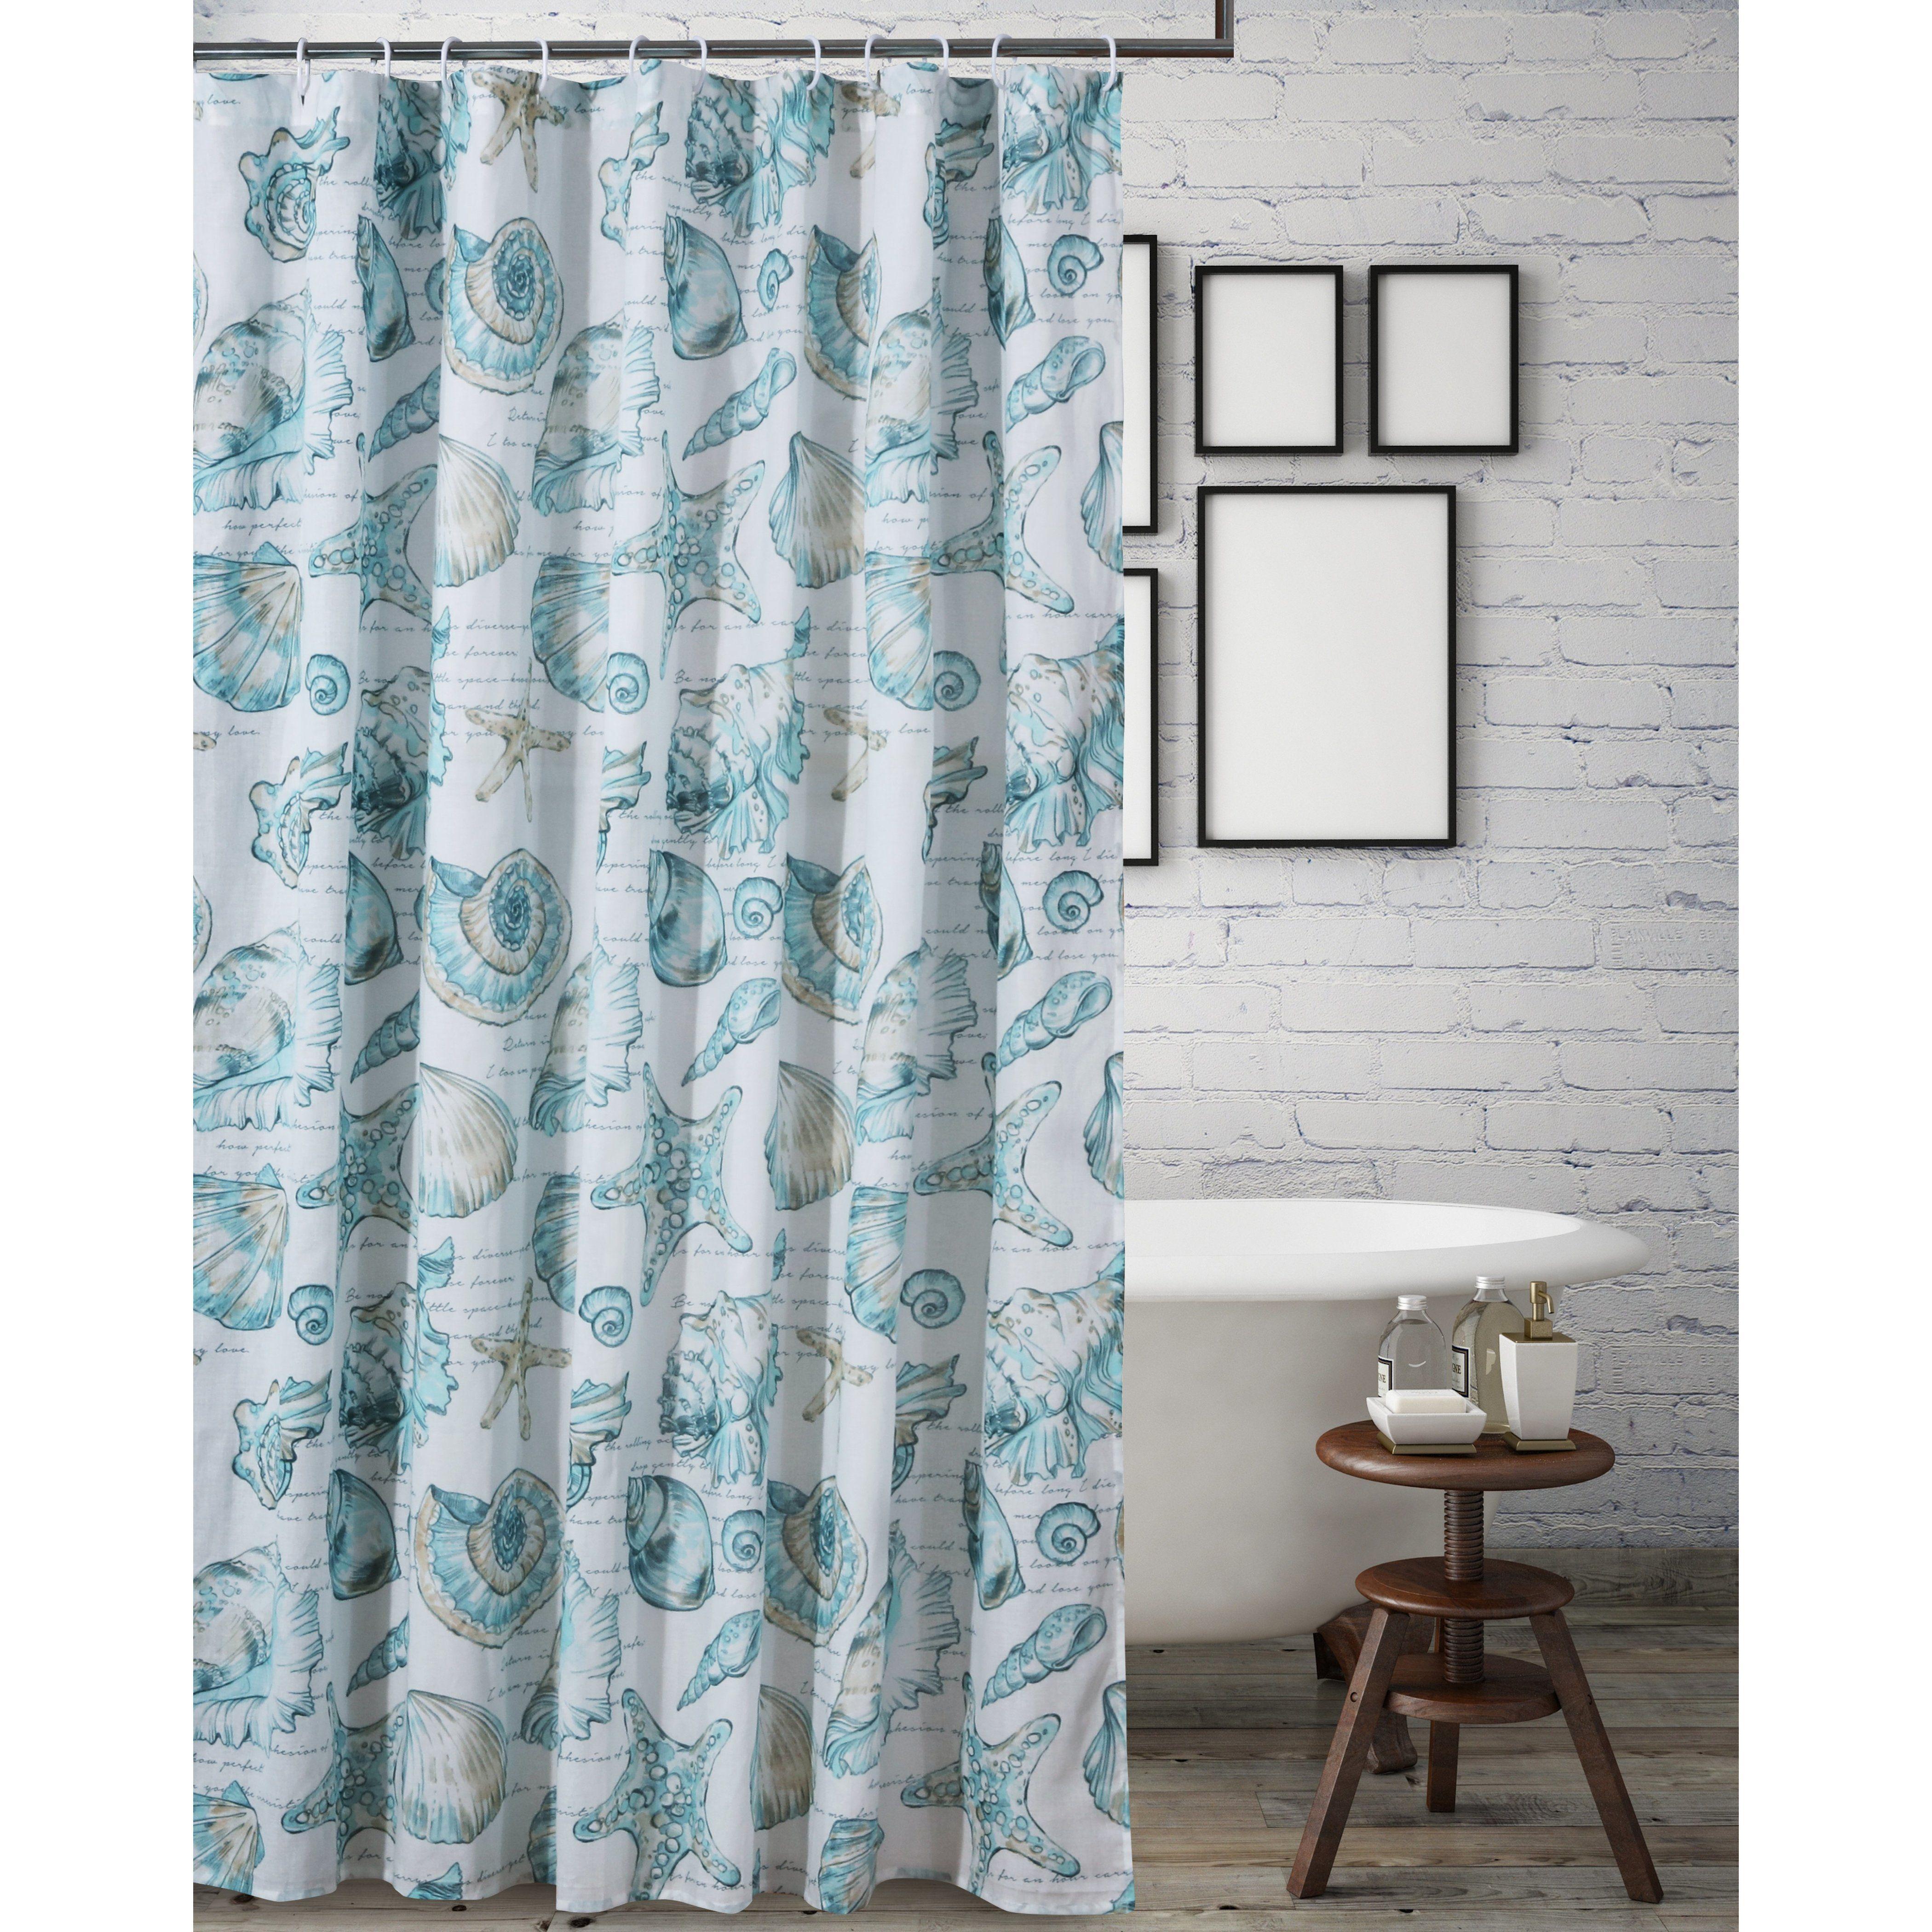 Cruz Multi Bath Shower Curtain Curtains New Toilet Shower